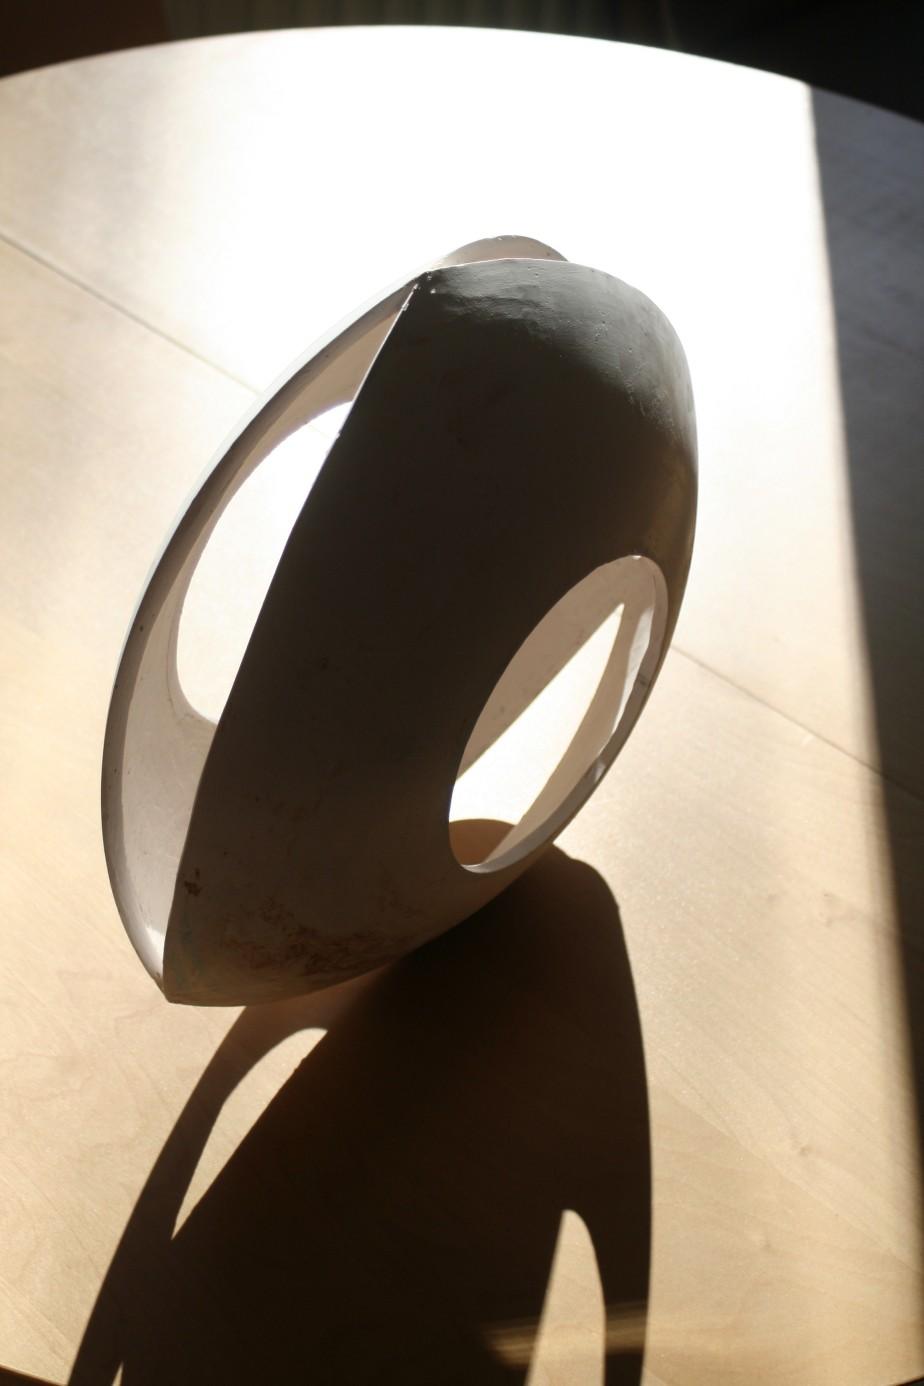 Relueaux Triangle Sculpture